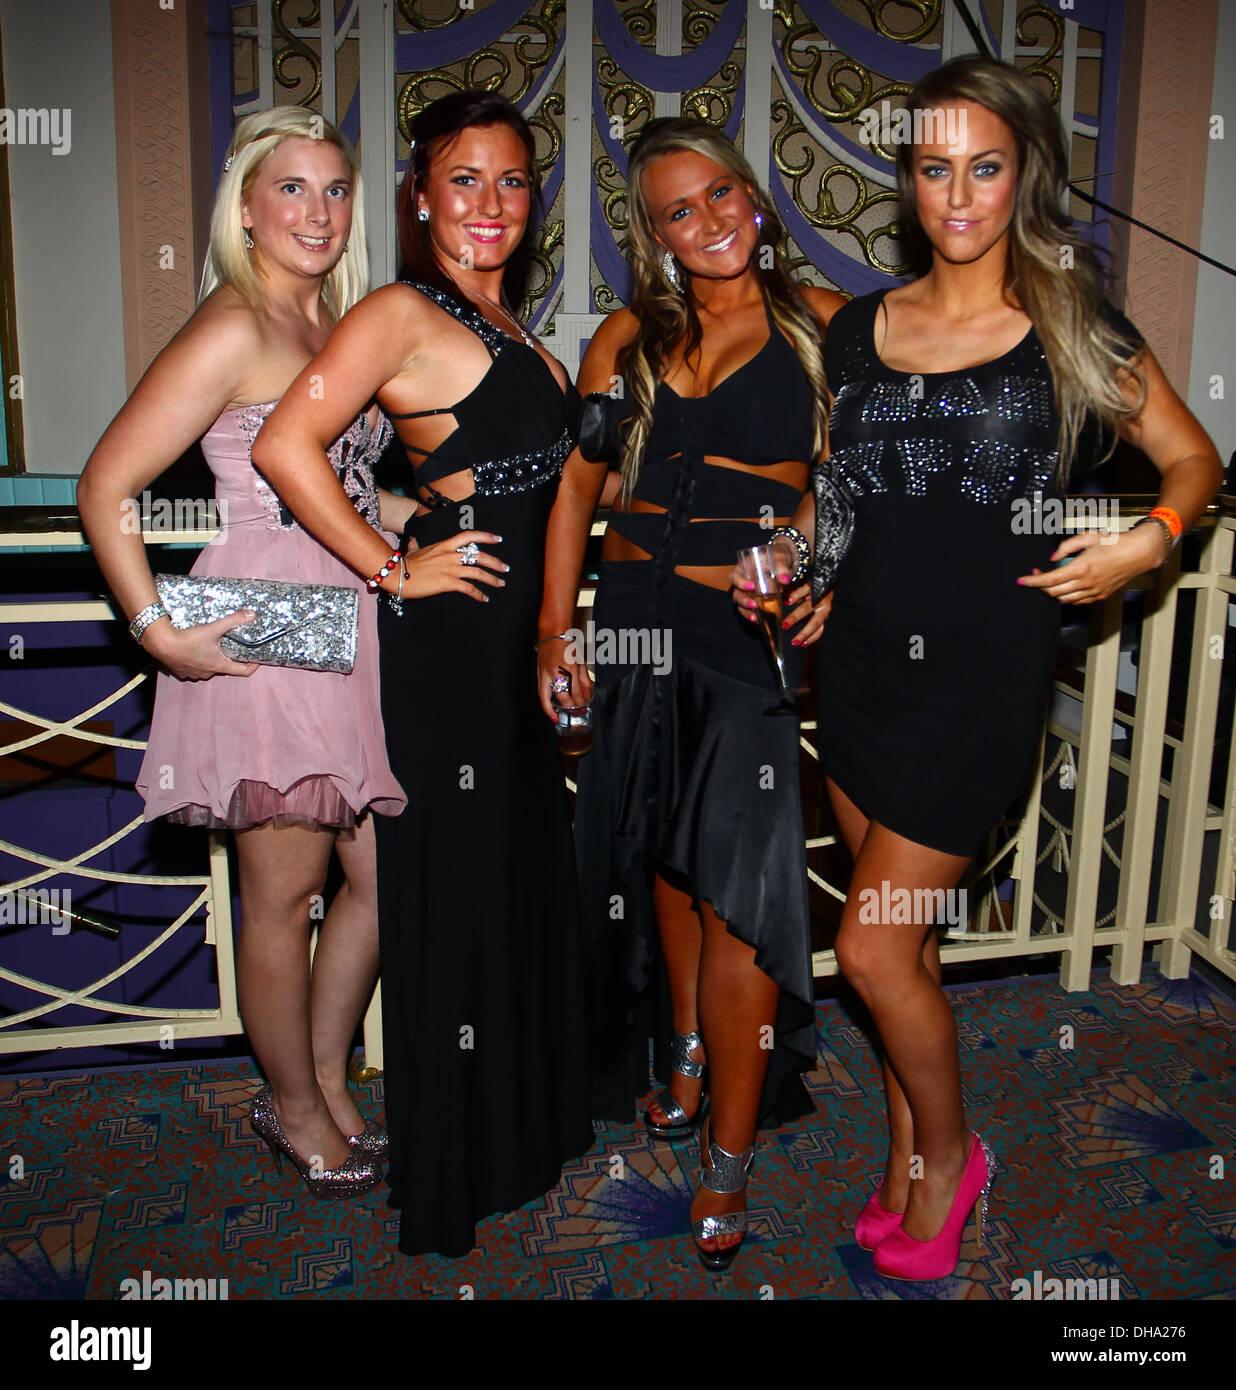 Danielle Mason from 'My Big Fat Gypsy Wedding' with her friends A Stock  Photo - Alamy